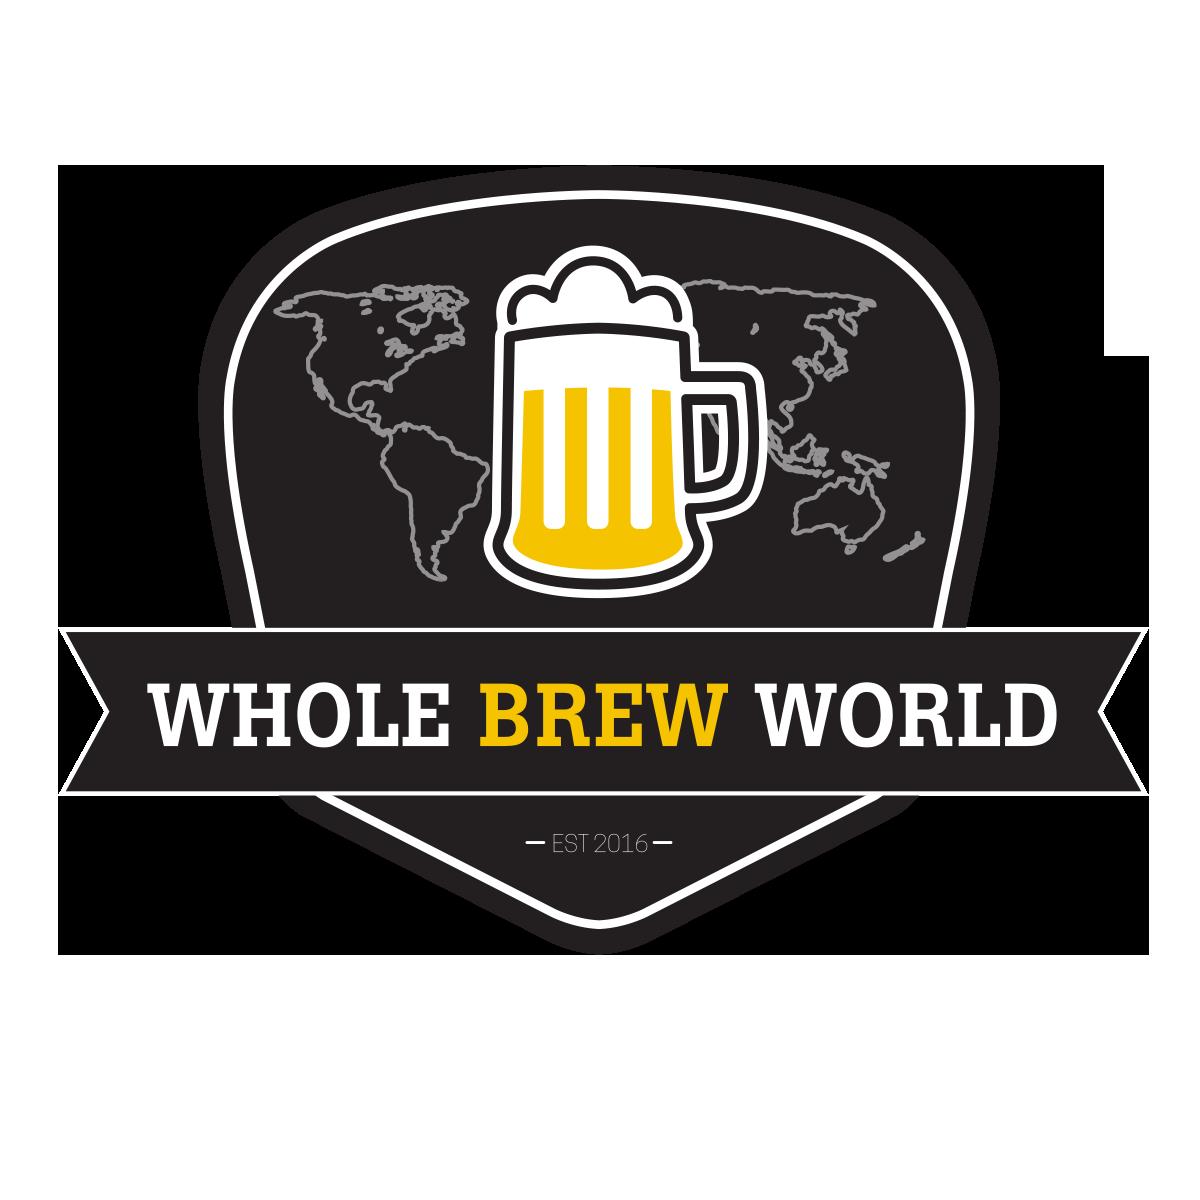 Whole Brew World Beer Trip Logo